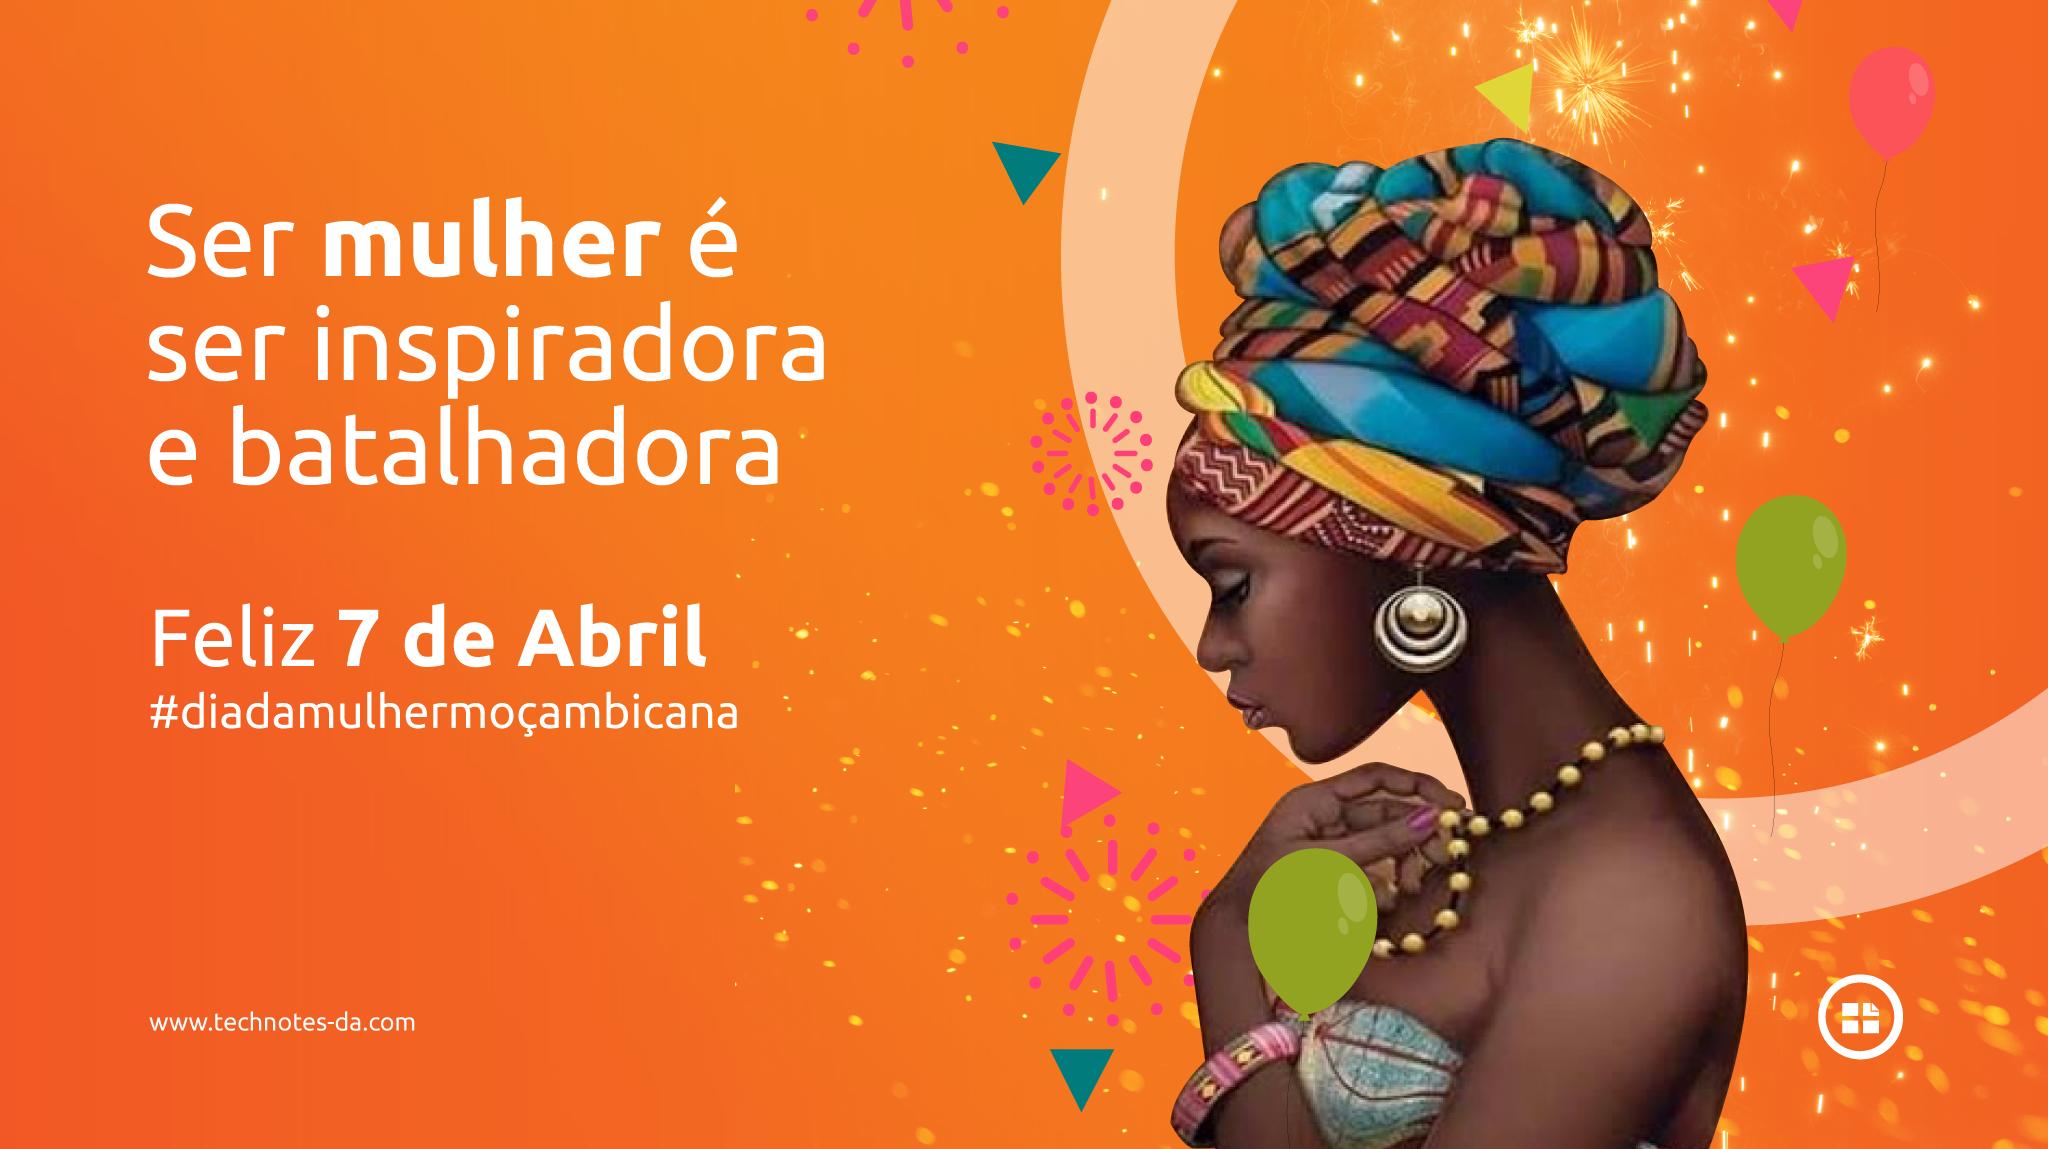 7 de Abril, dia Mulher Mocambicana - technotes